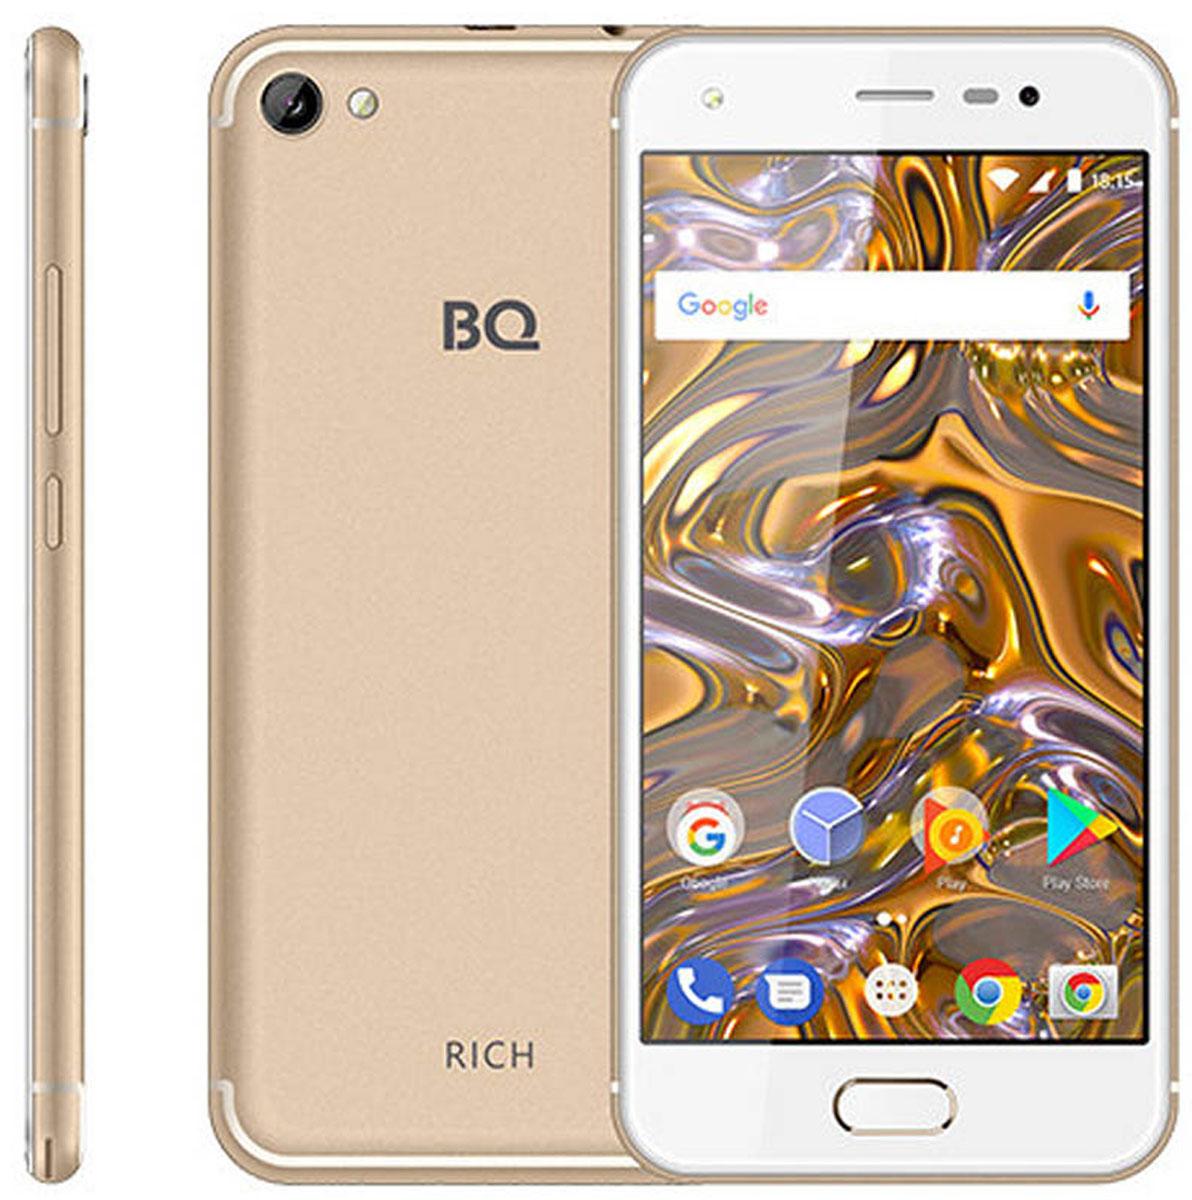 Смартфон BQ Mobile 5012L Rich 8 GB, золотистый смартфон bq mobile bq 5012l rich black